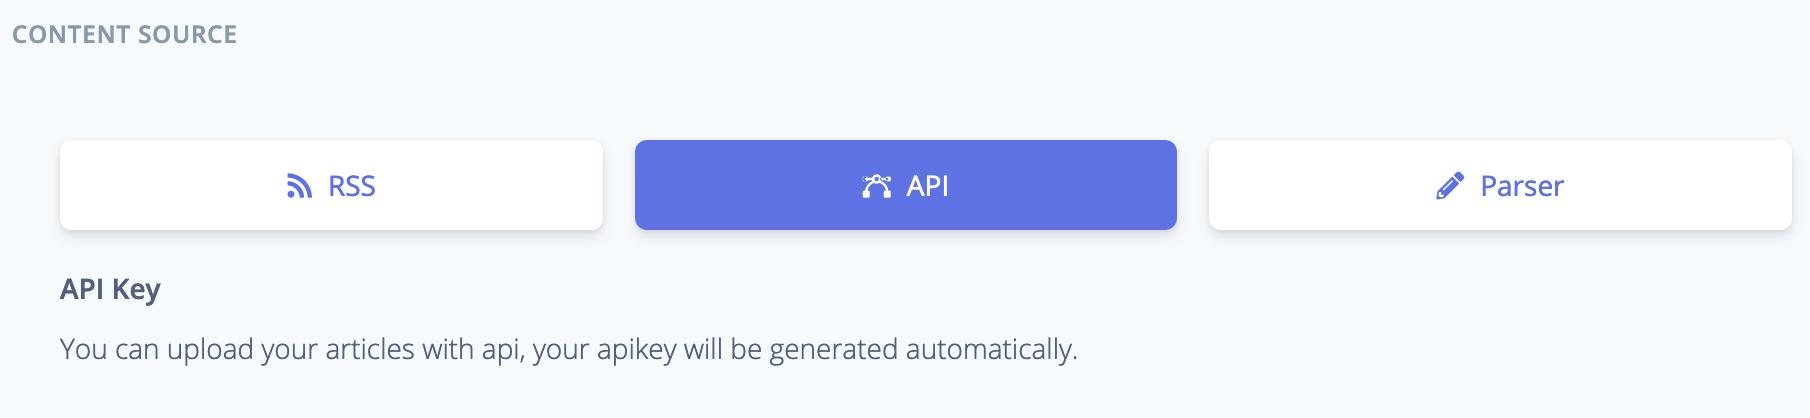 API as Content Source - BotTalk Audio CMS